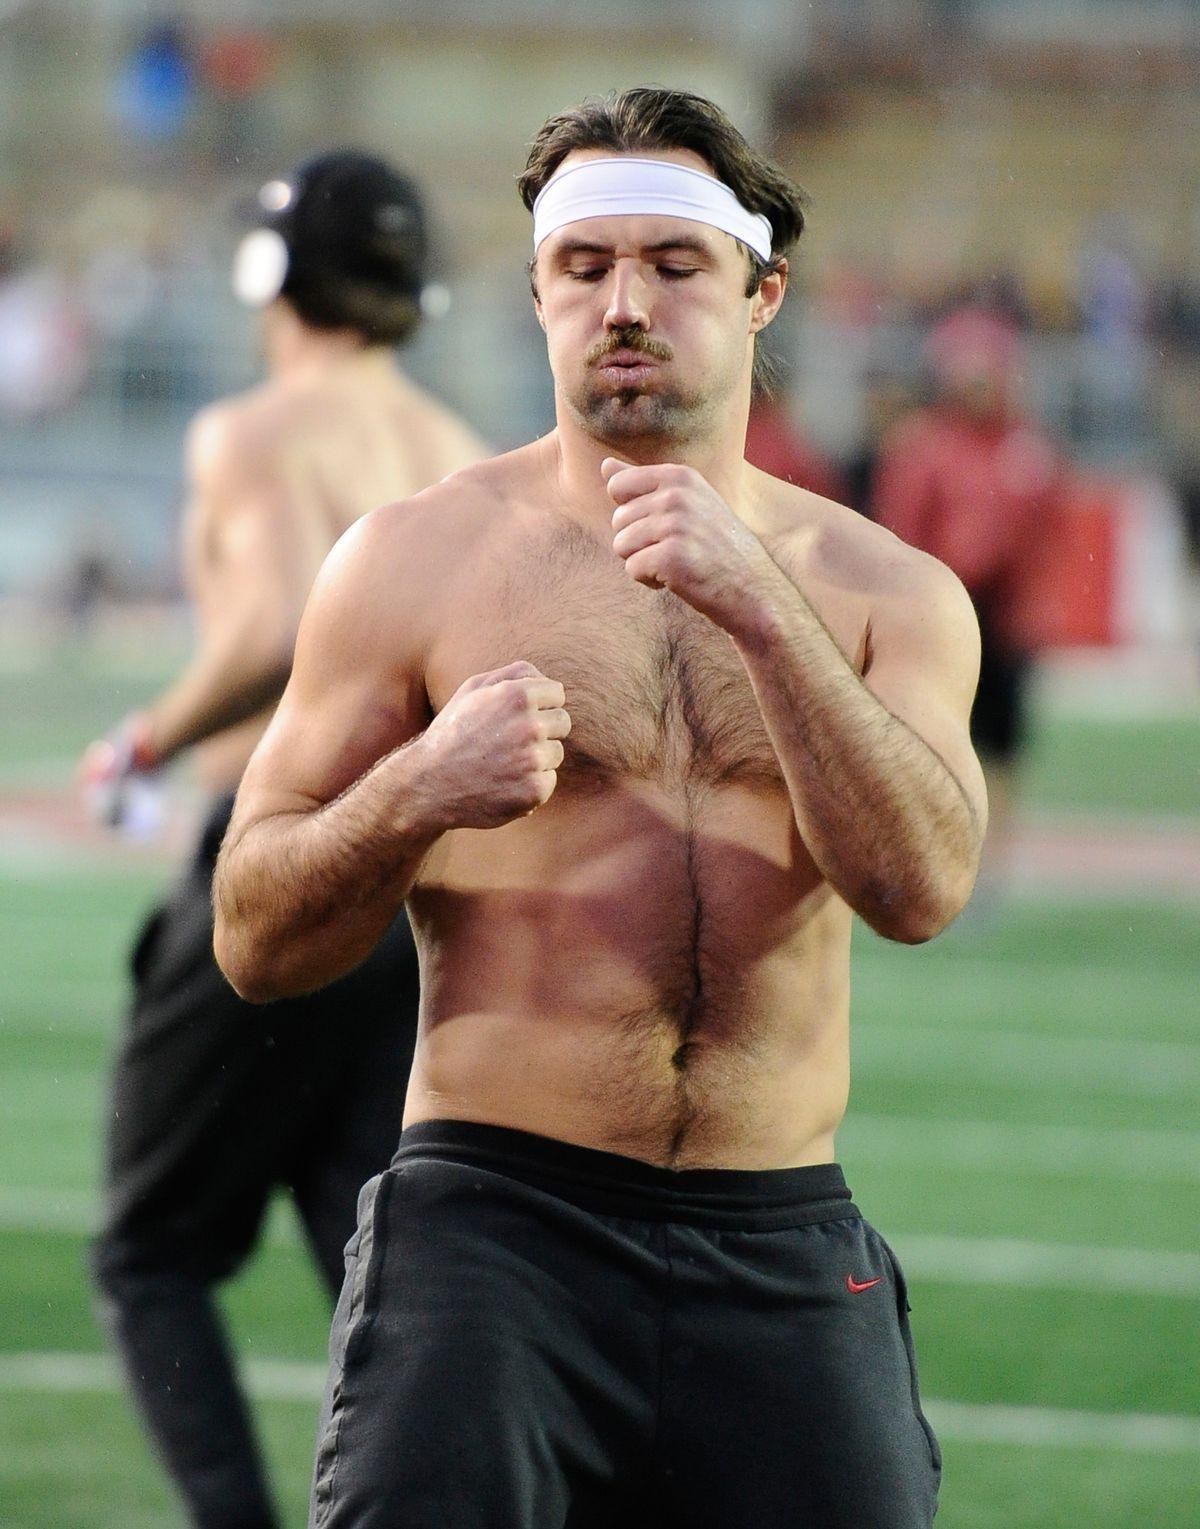 Gardner Minshew shirtless body in 2019 New mexico, Usa